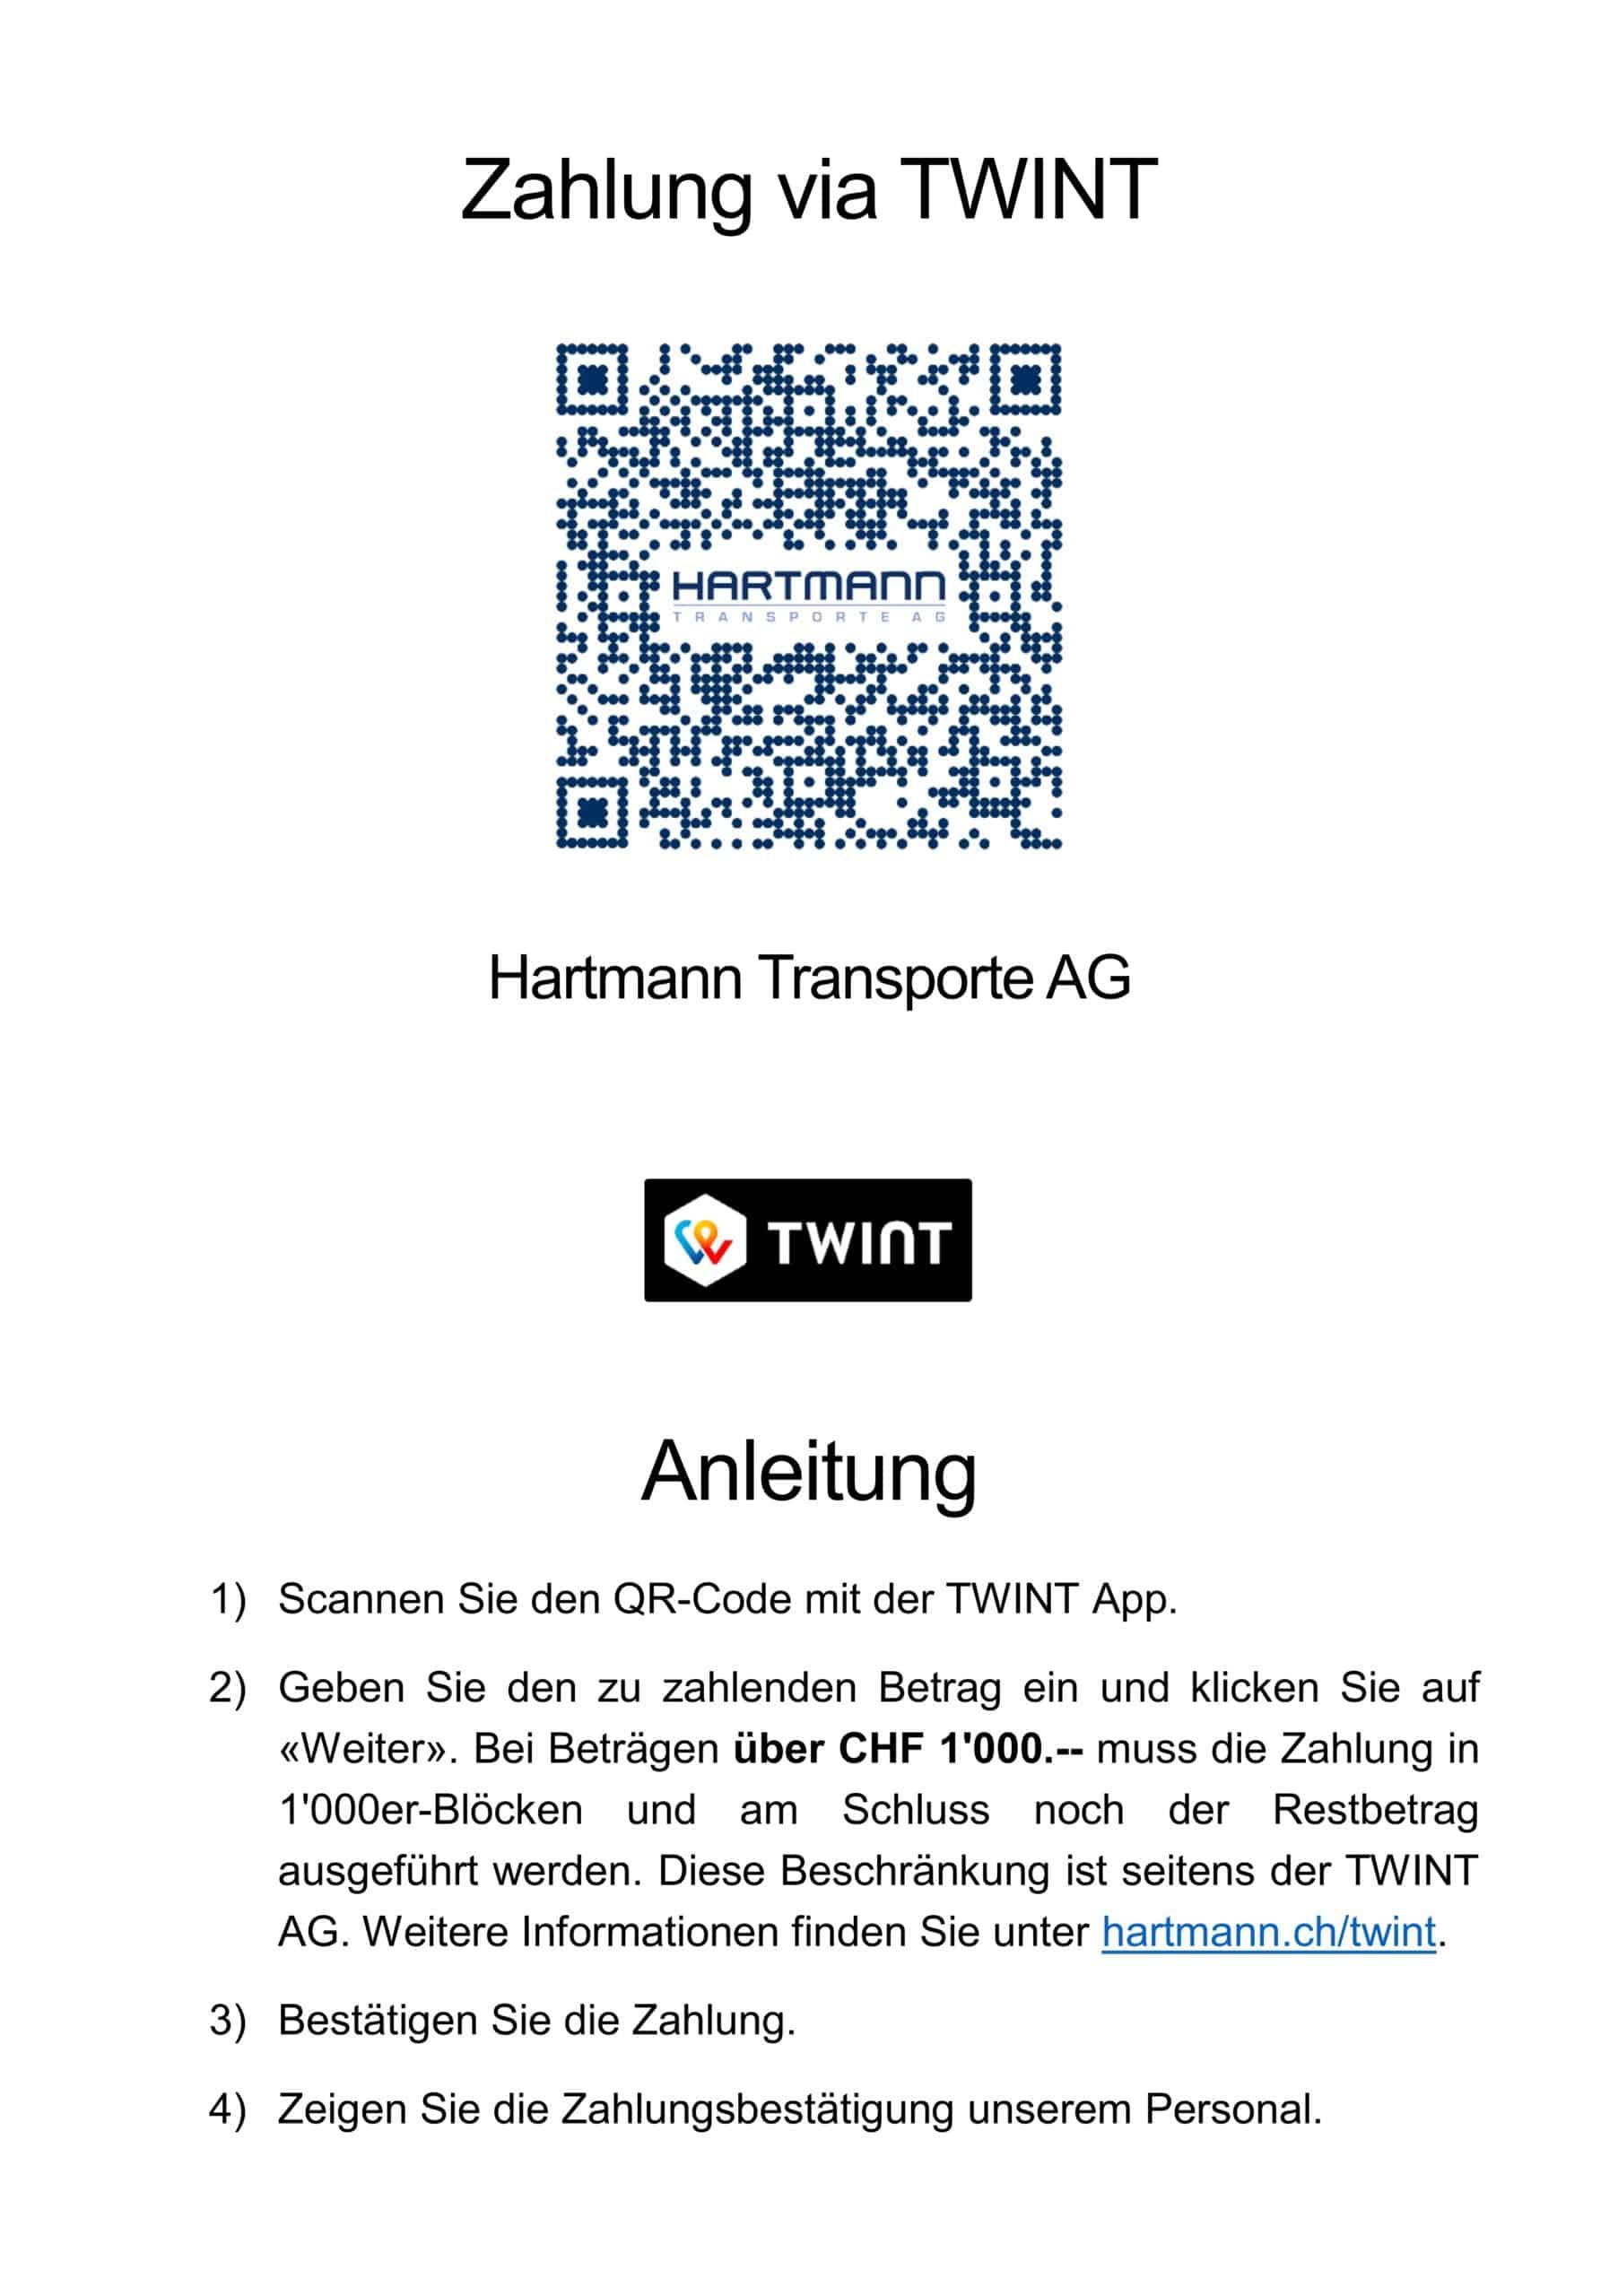 Zahlung via TWINT - Hartmann Transporte AG